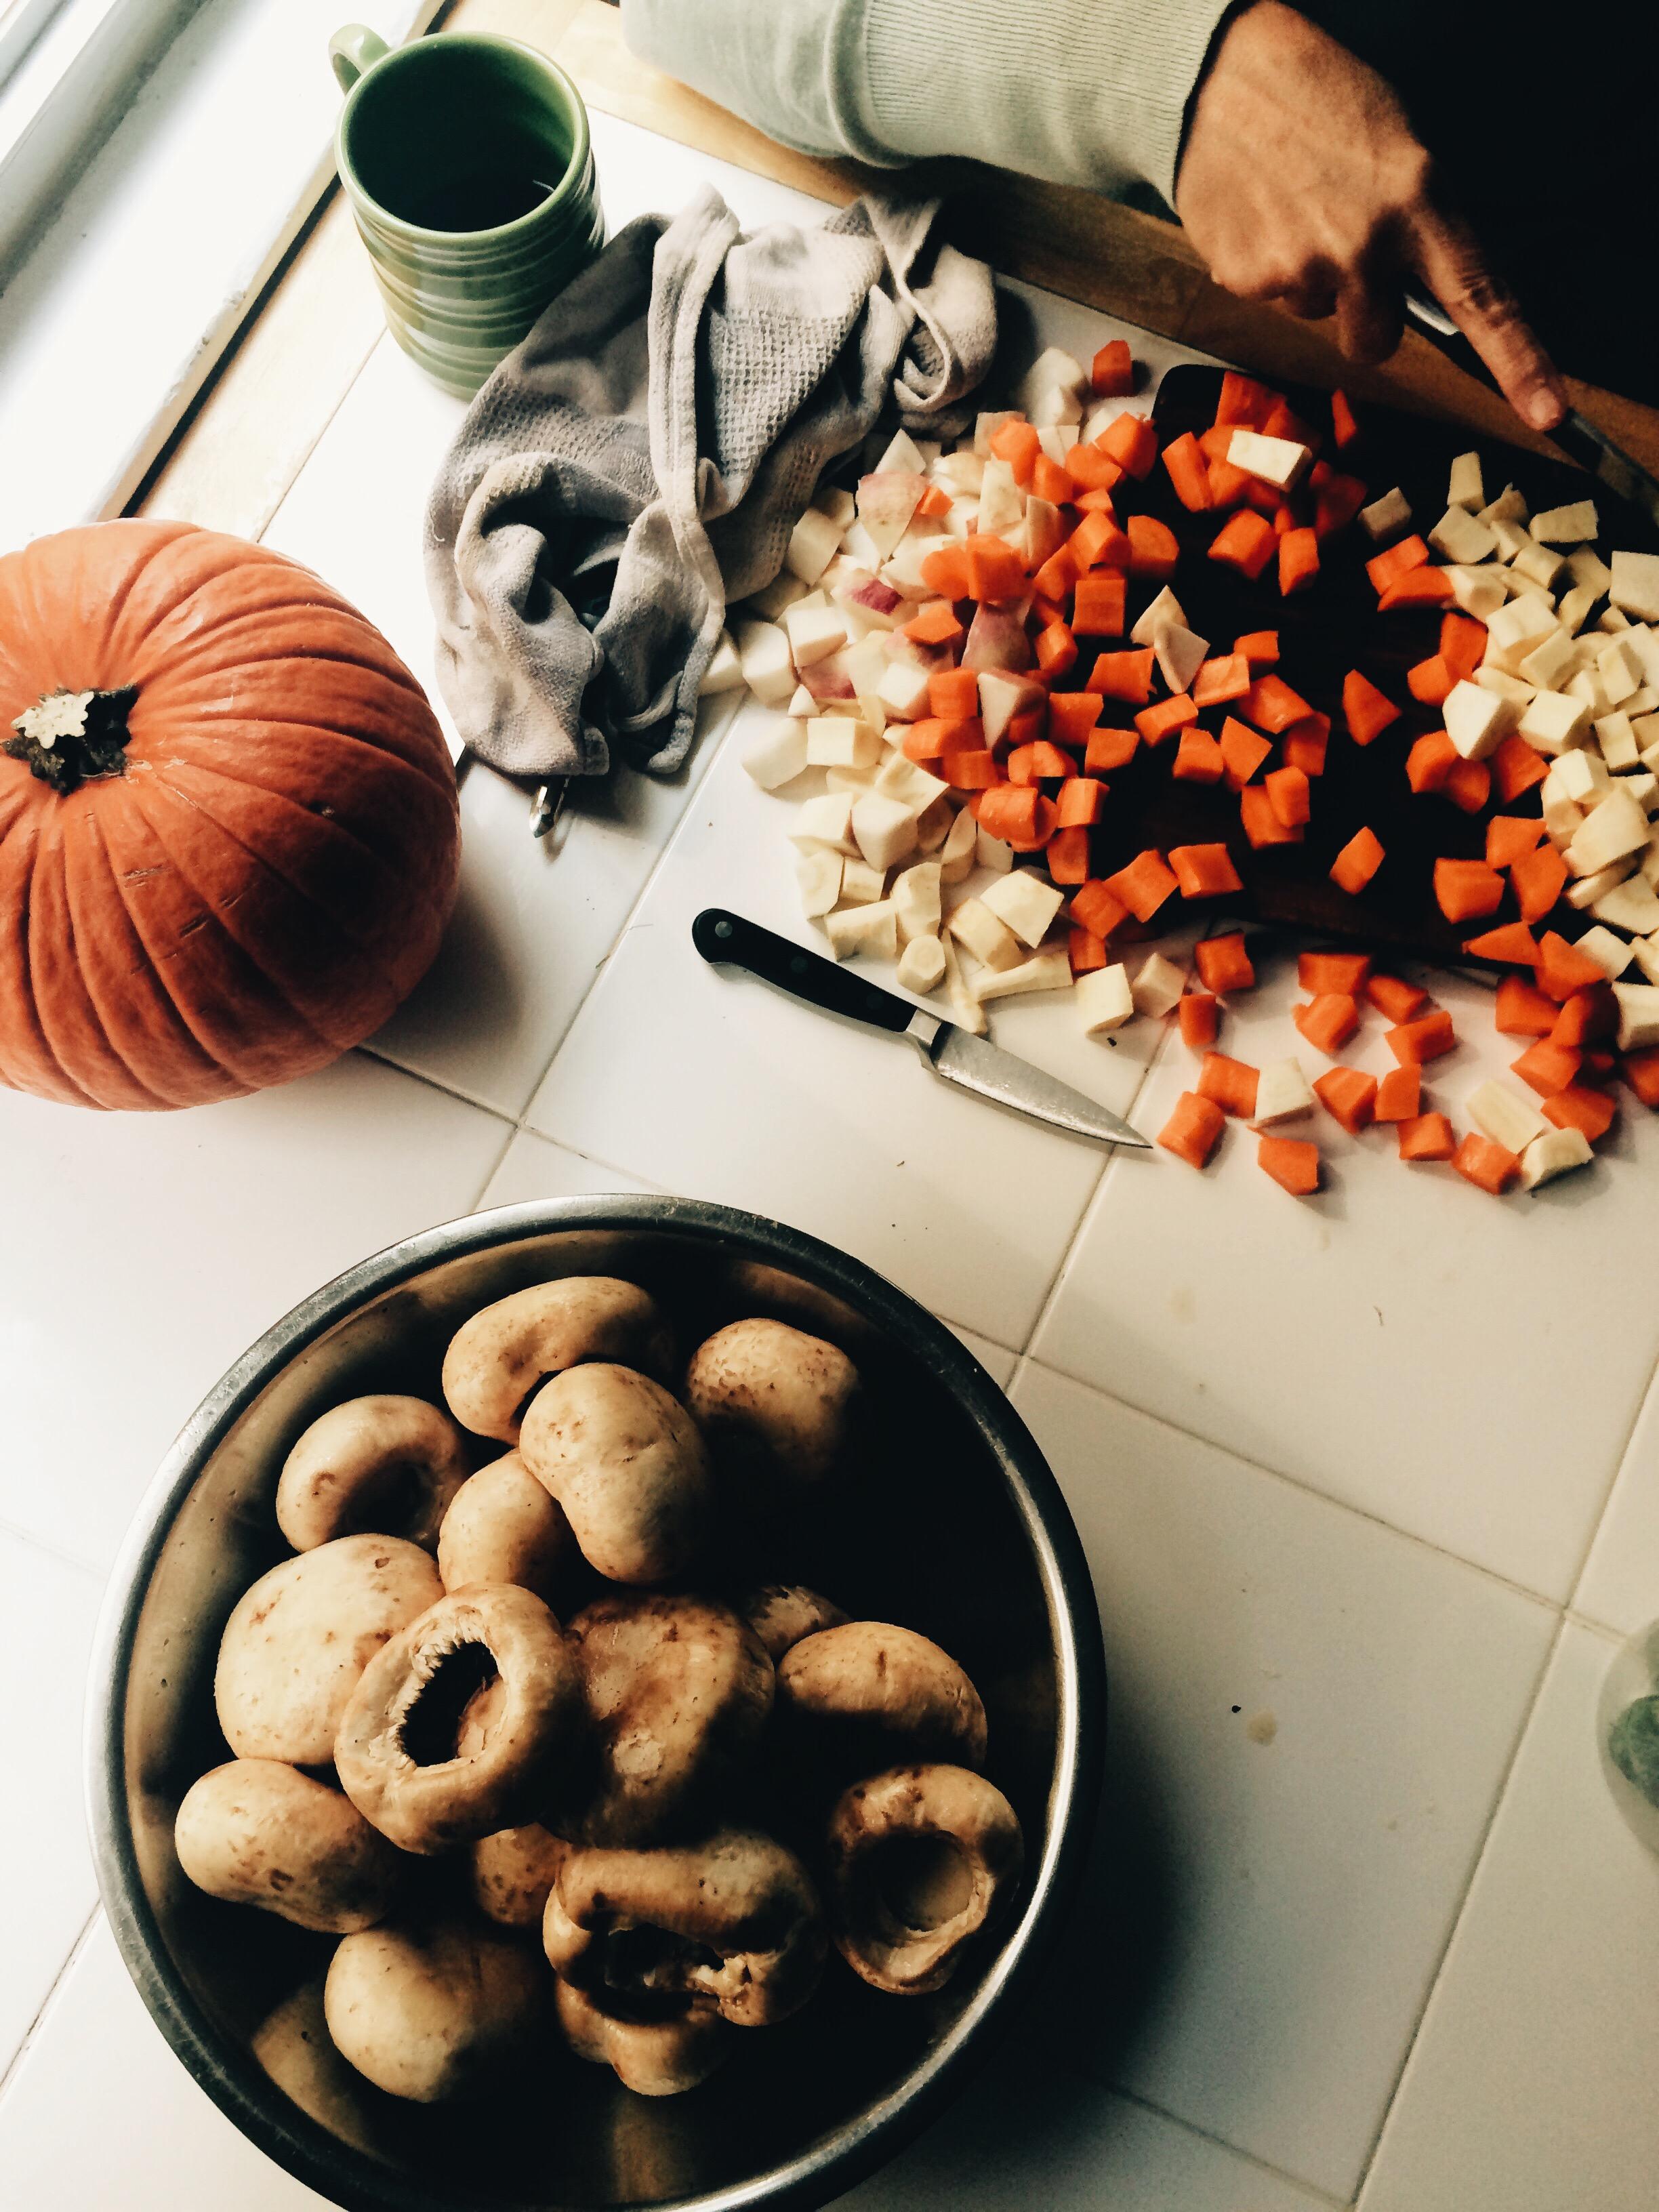 Food preparations!